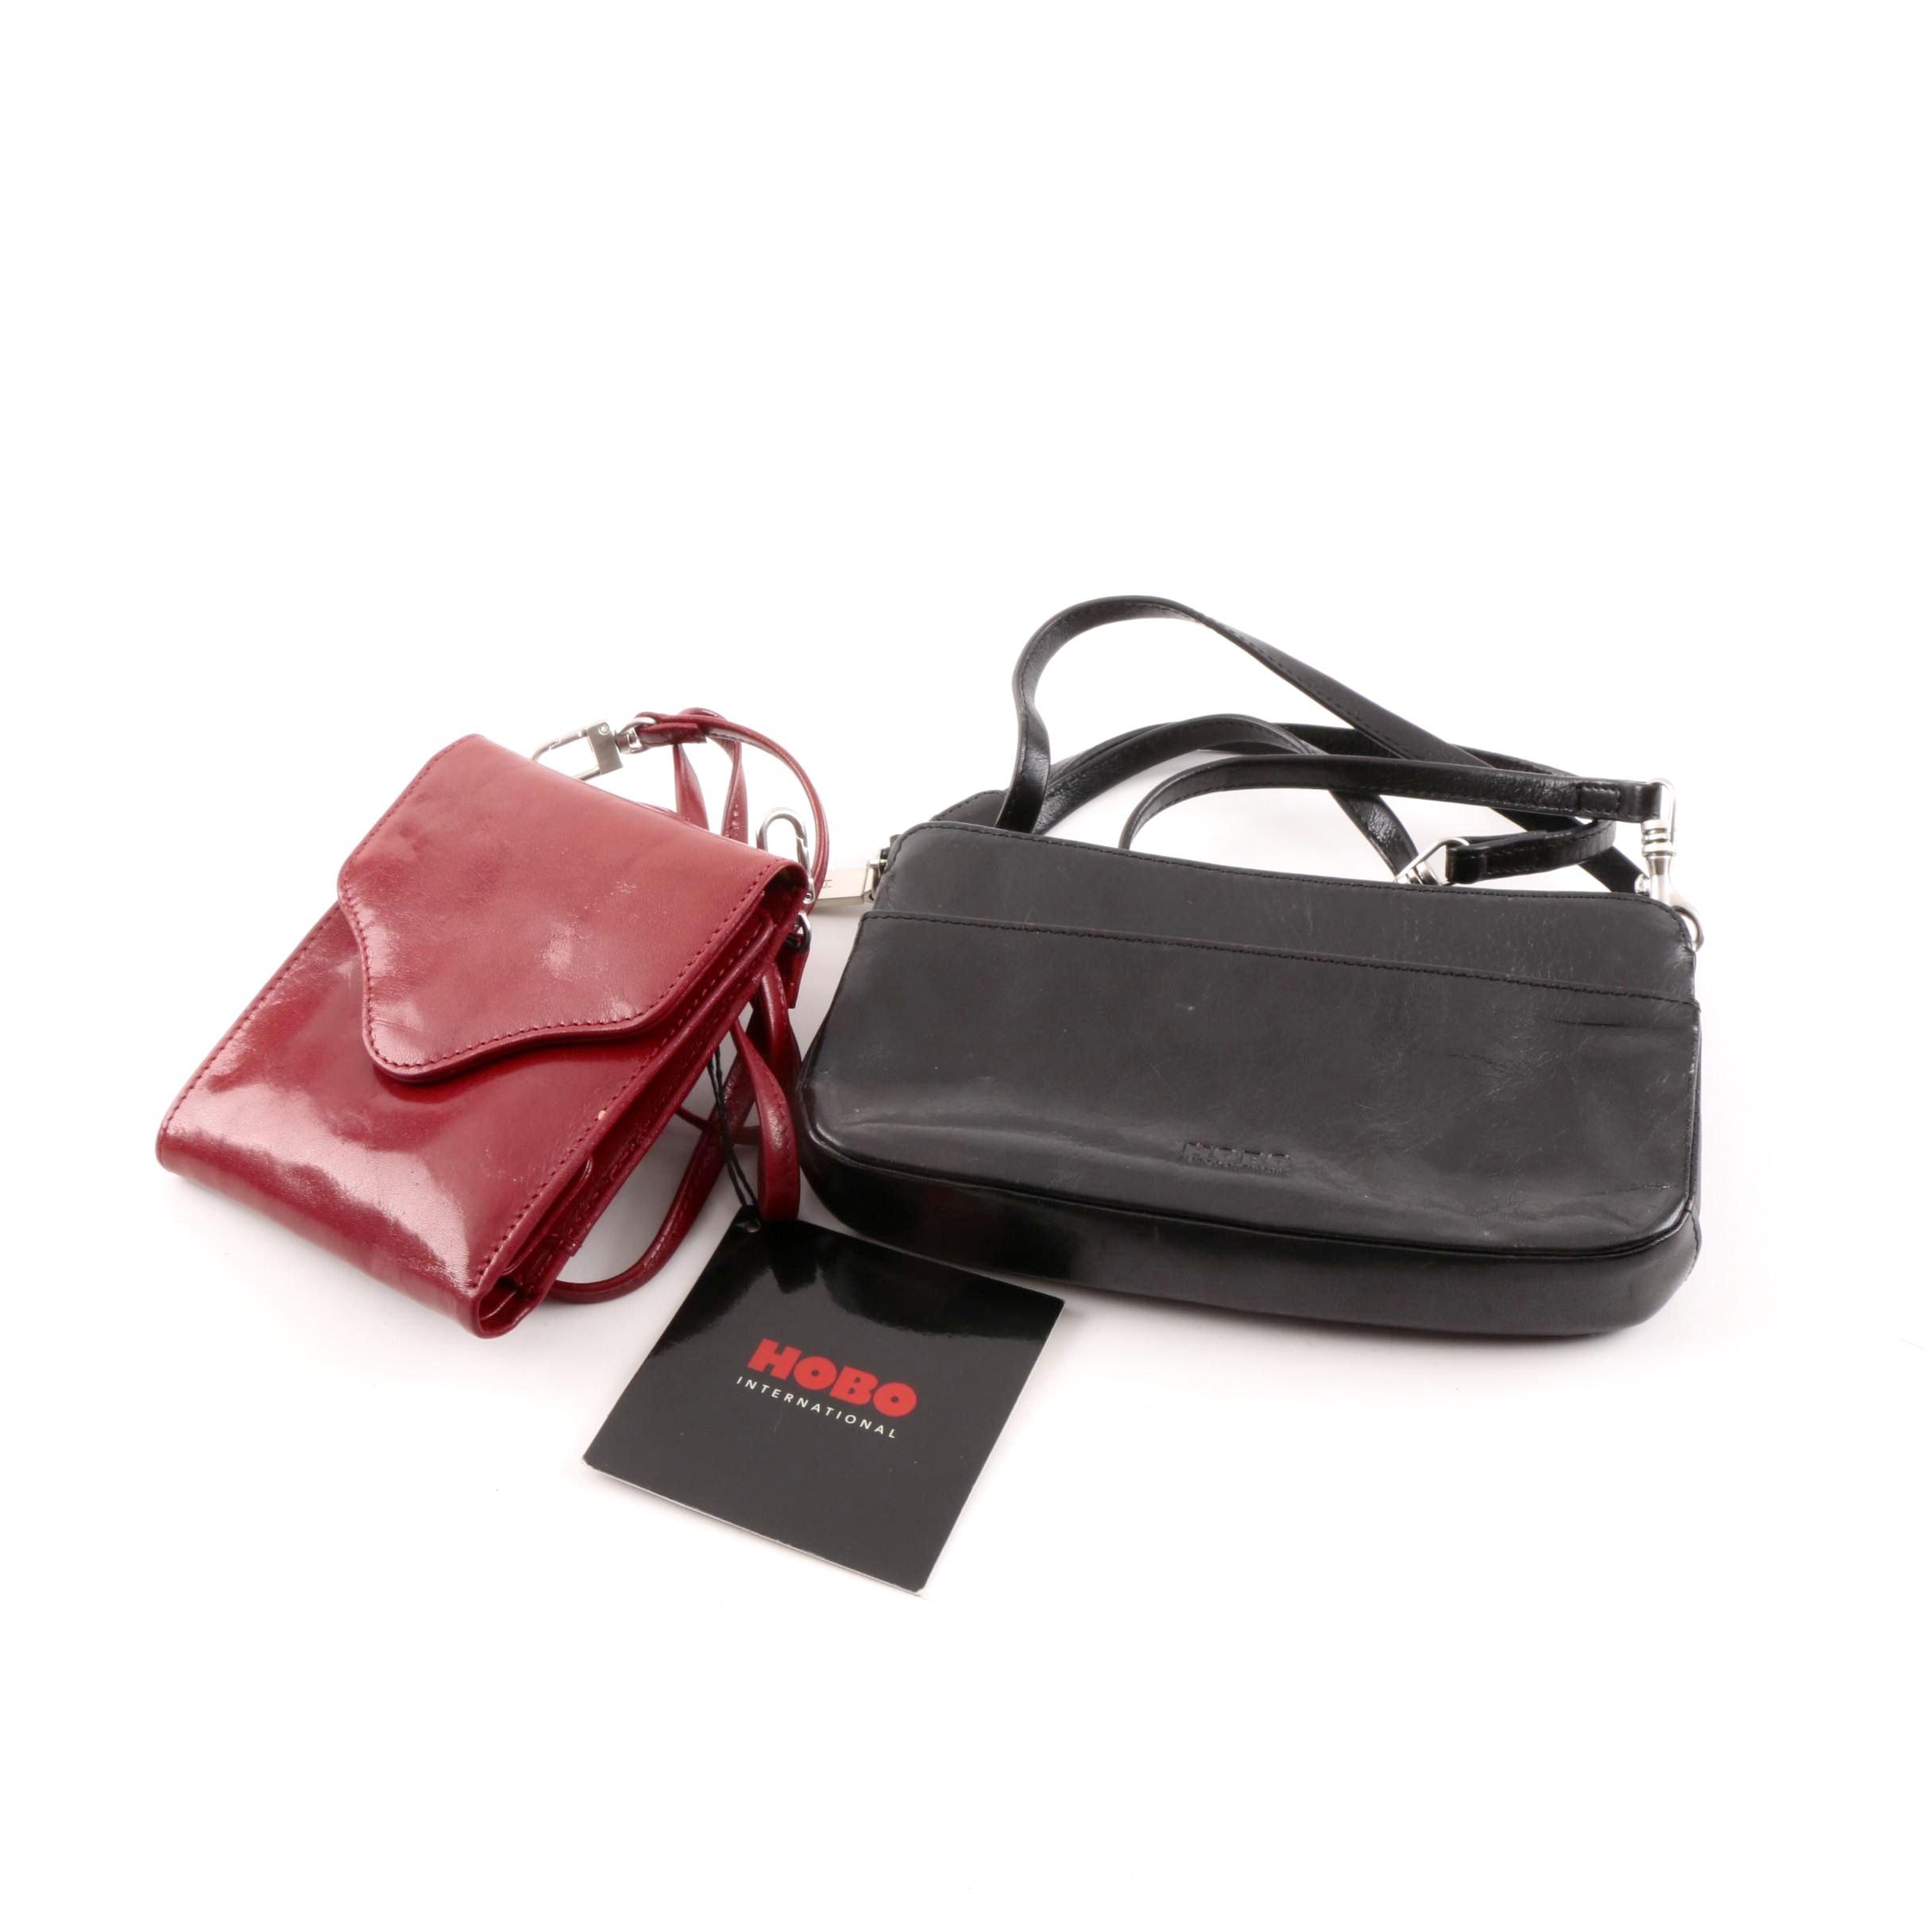 HOBO International Crossbody Bags